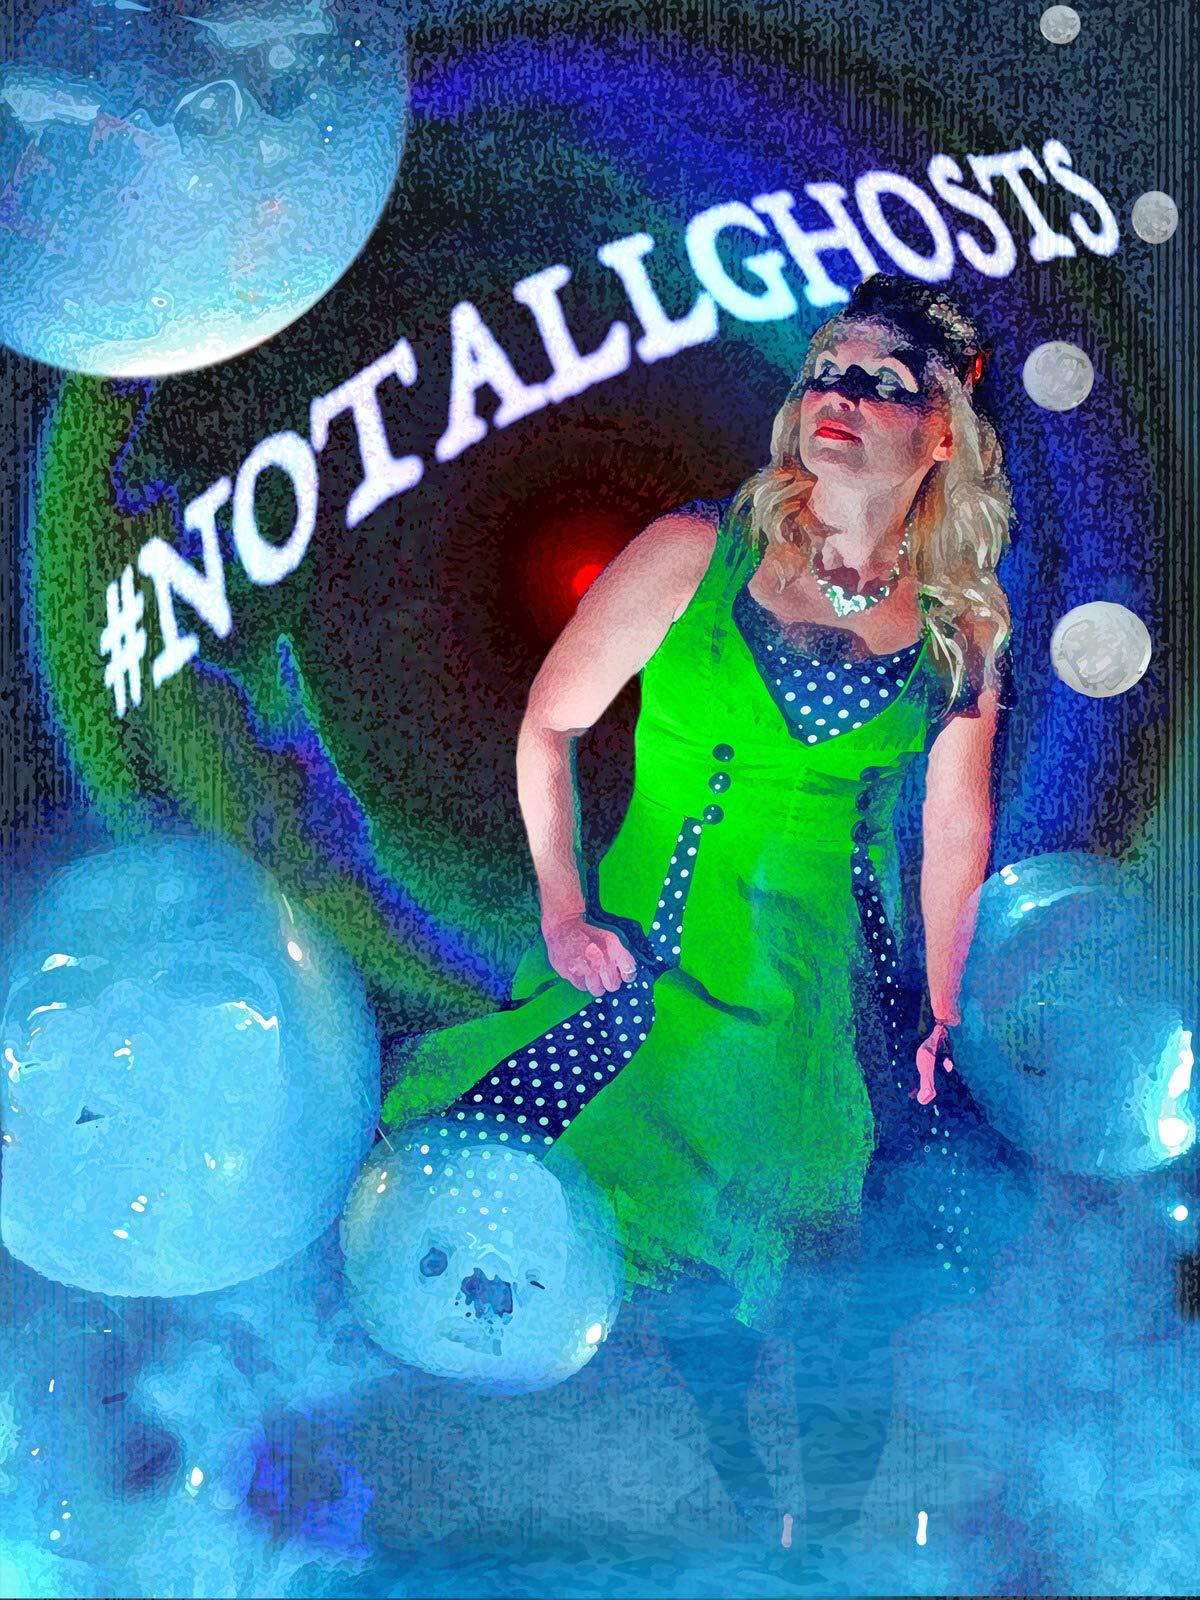 #NotAllGhosts